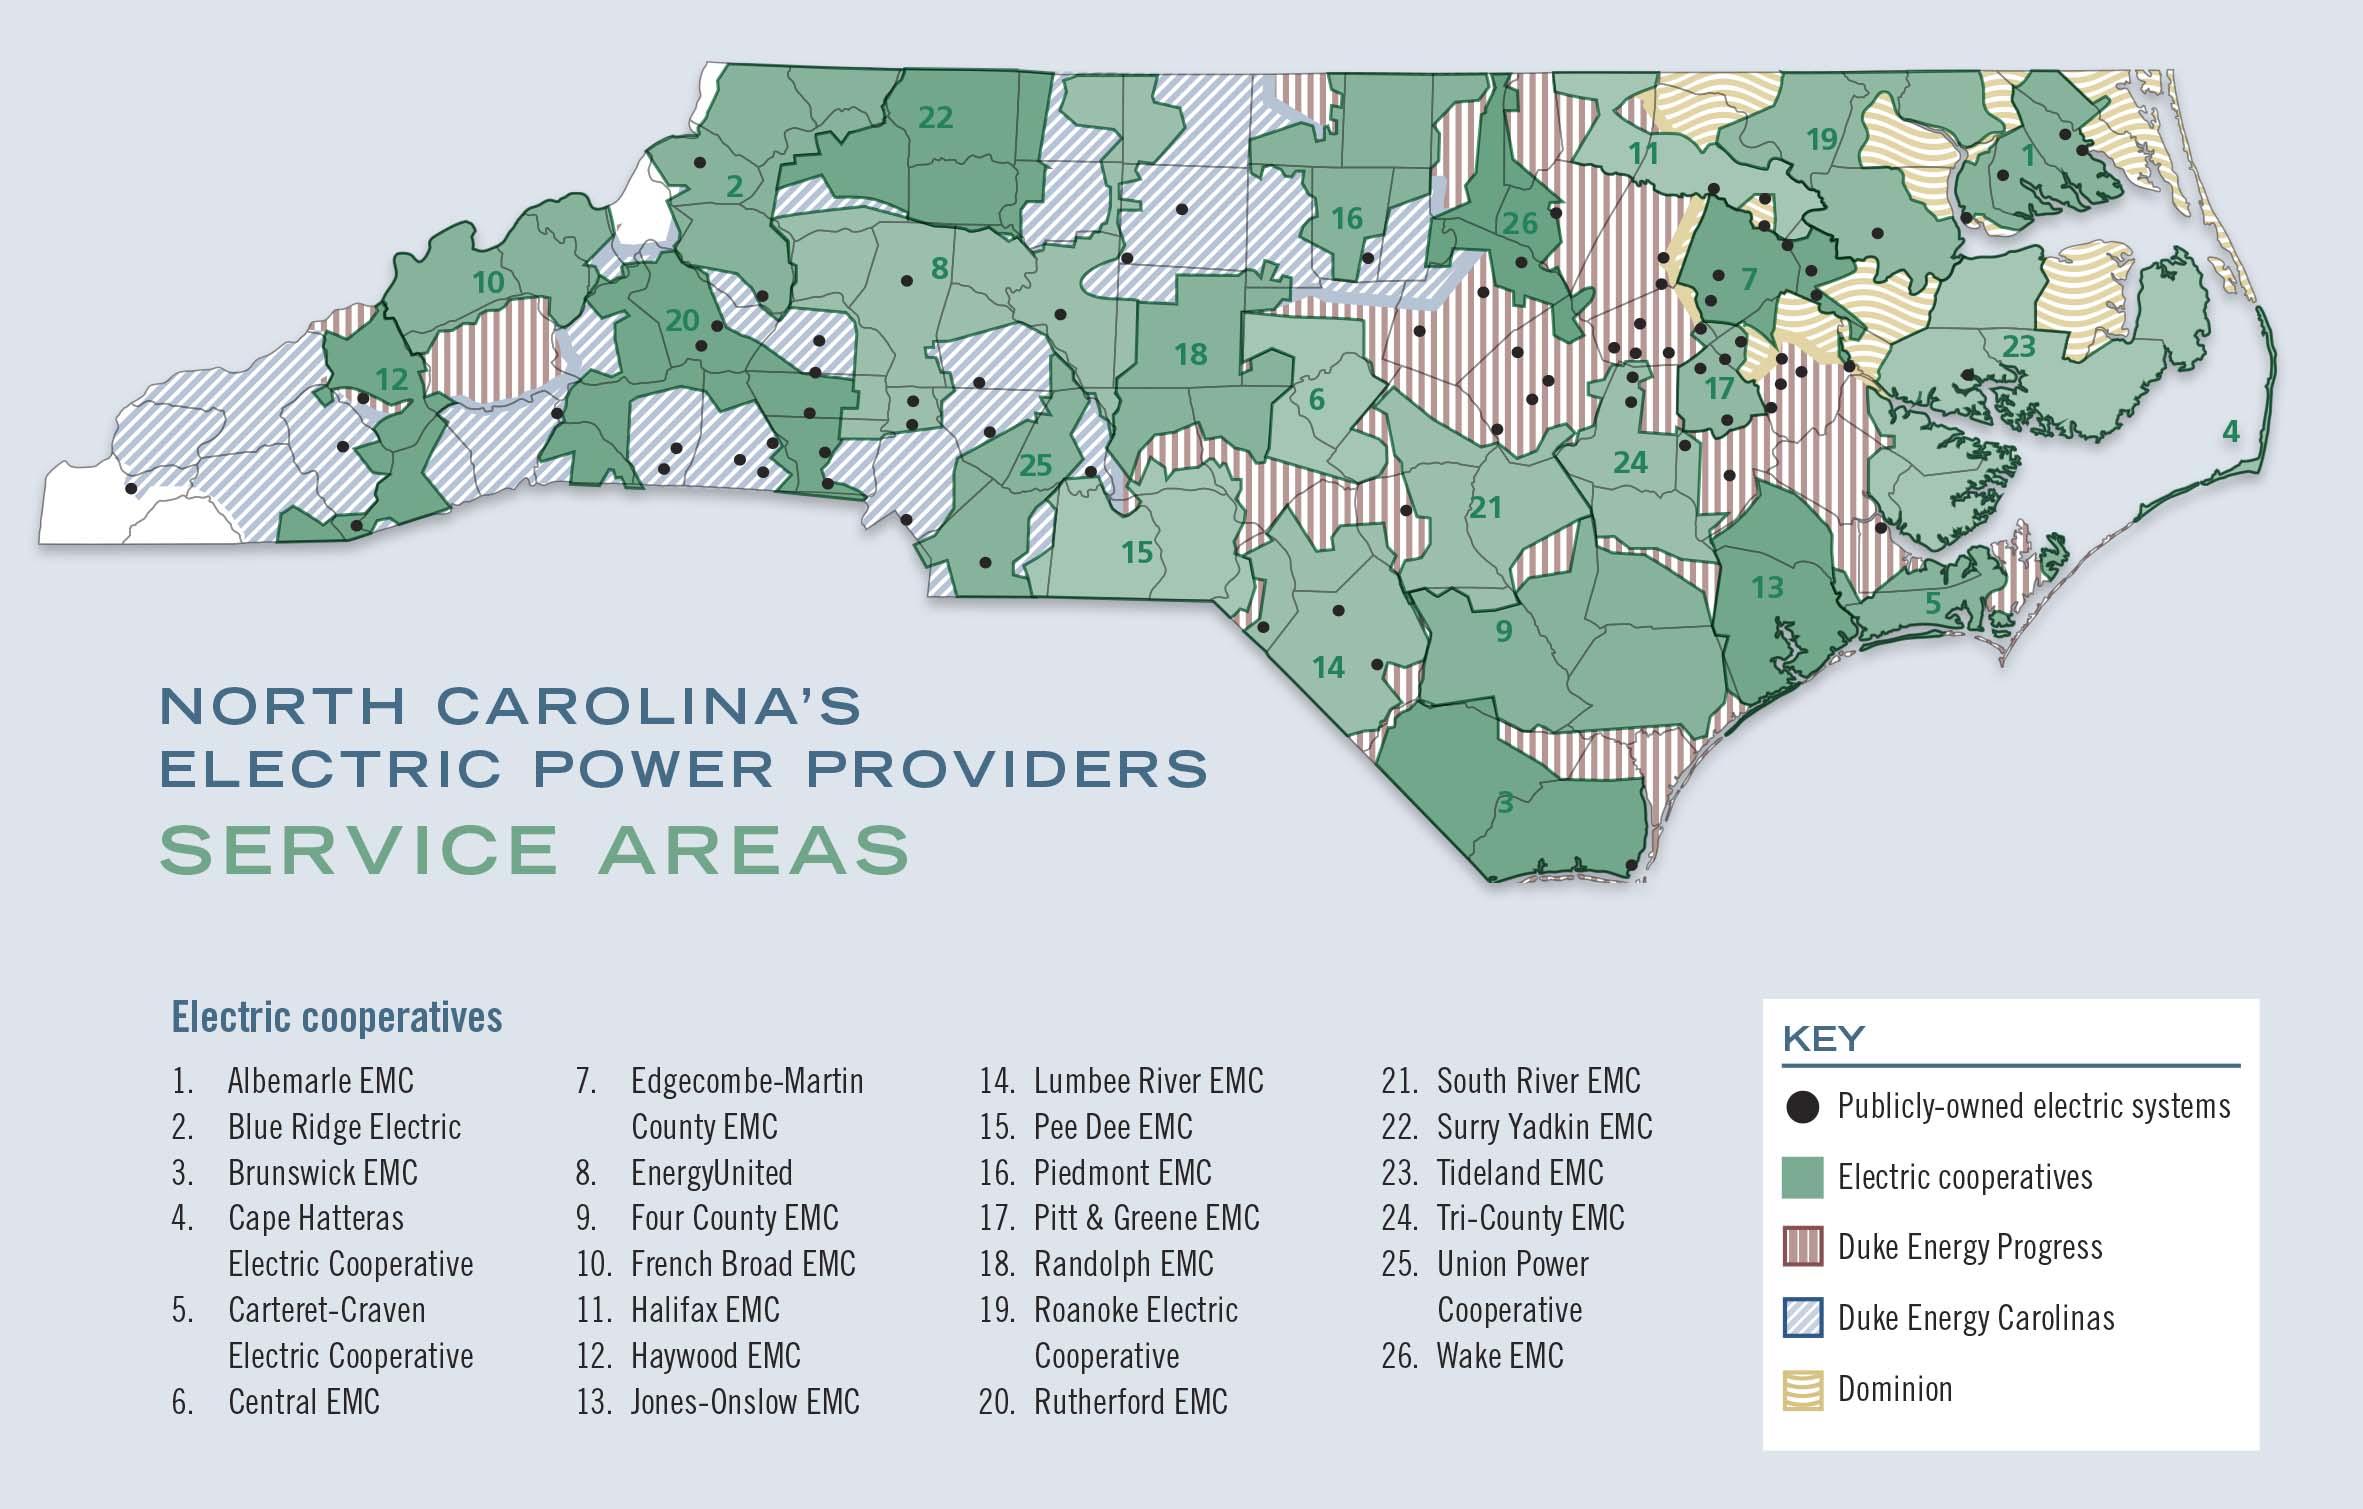 A Guide To North Carolina's Electric Power Providers - Carolina Country - Florida City Gas Service Area Map